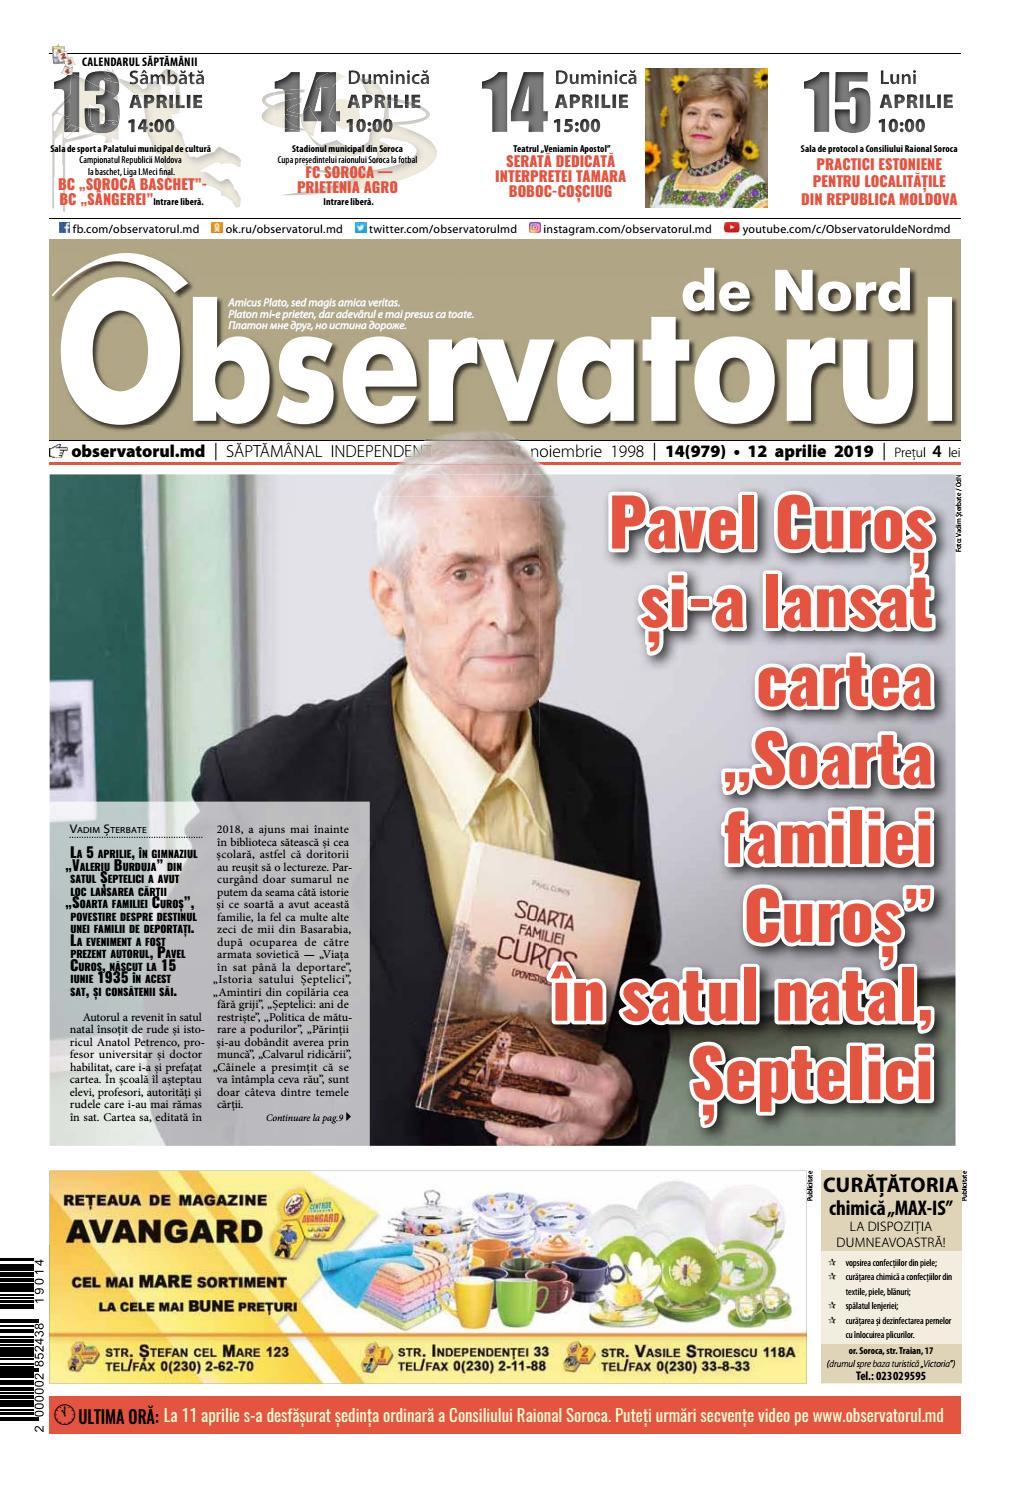 Articole de ziar despre varice